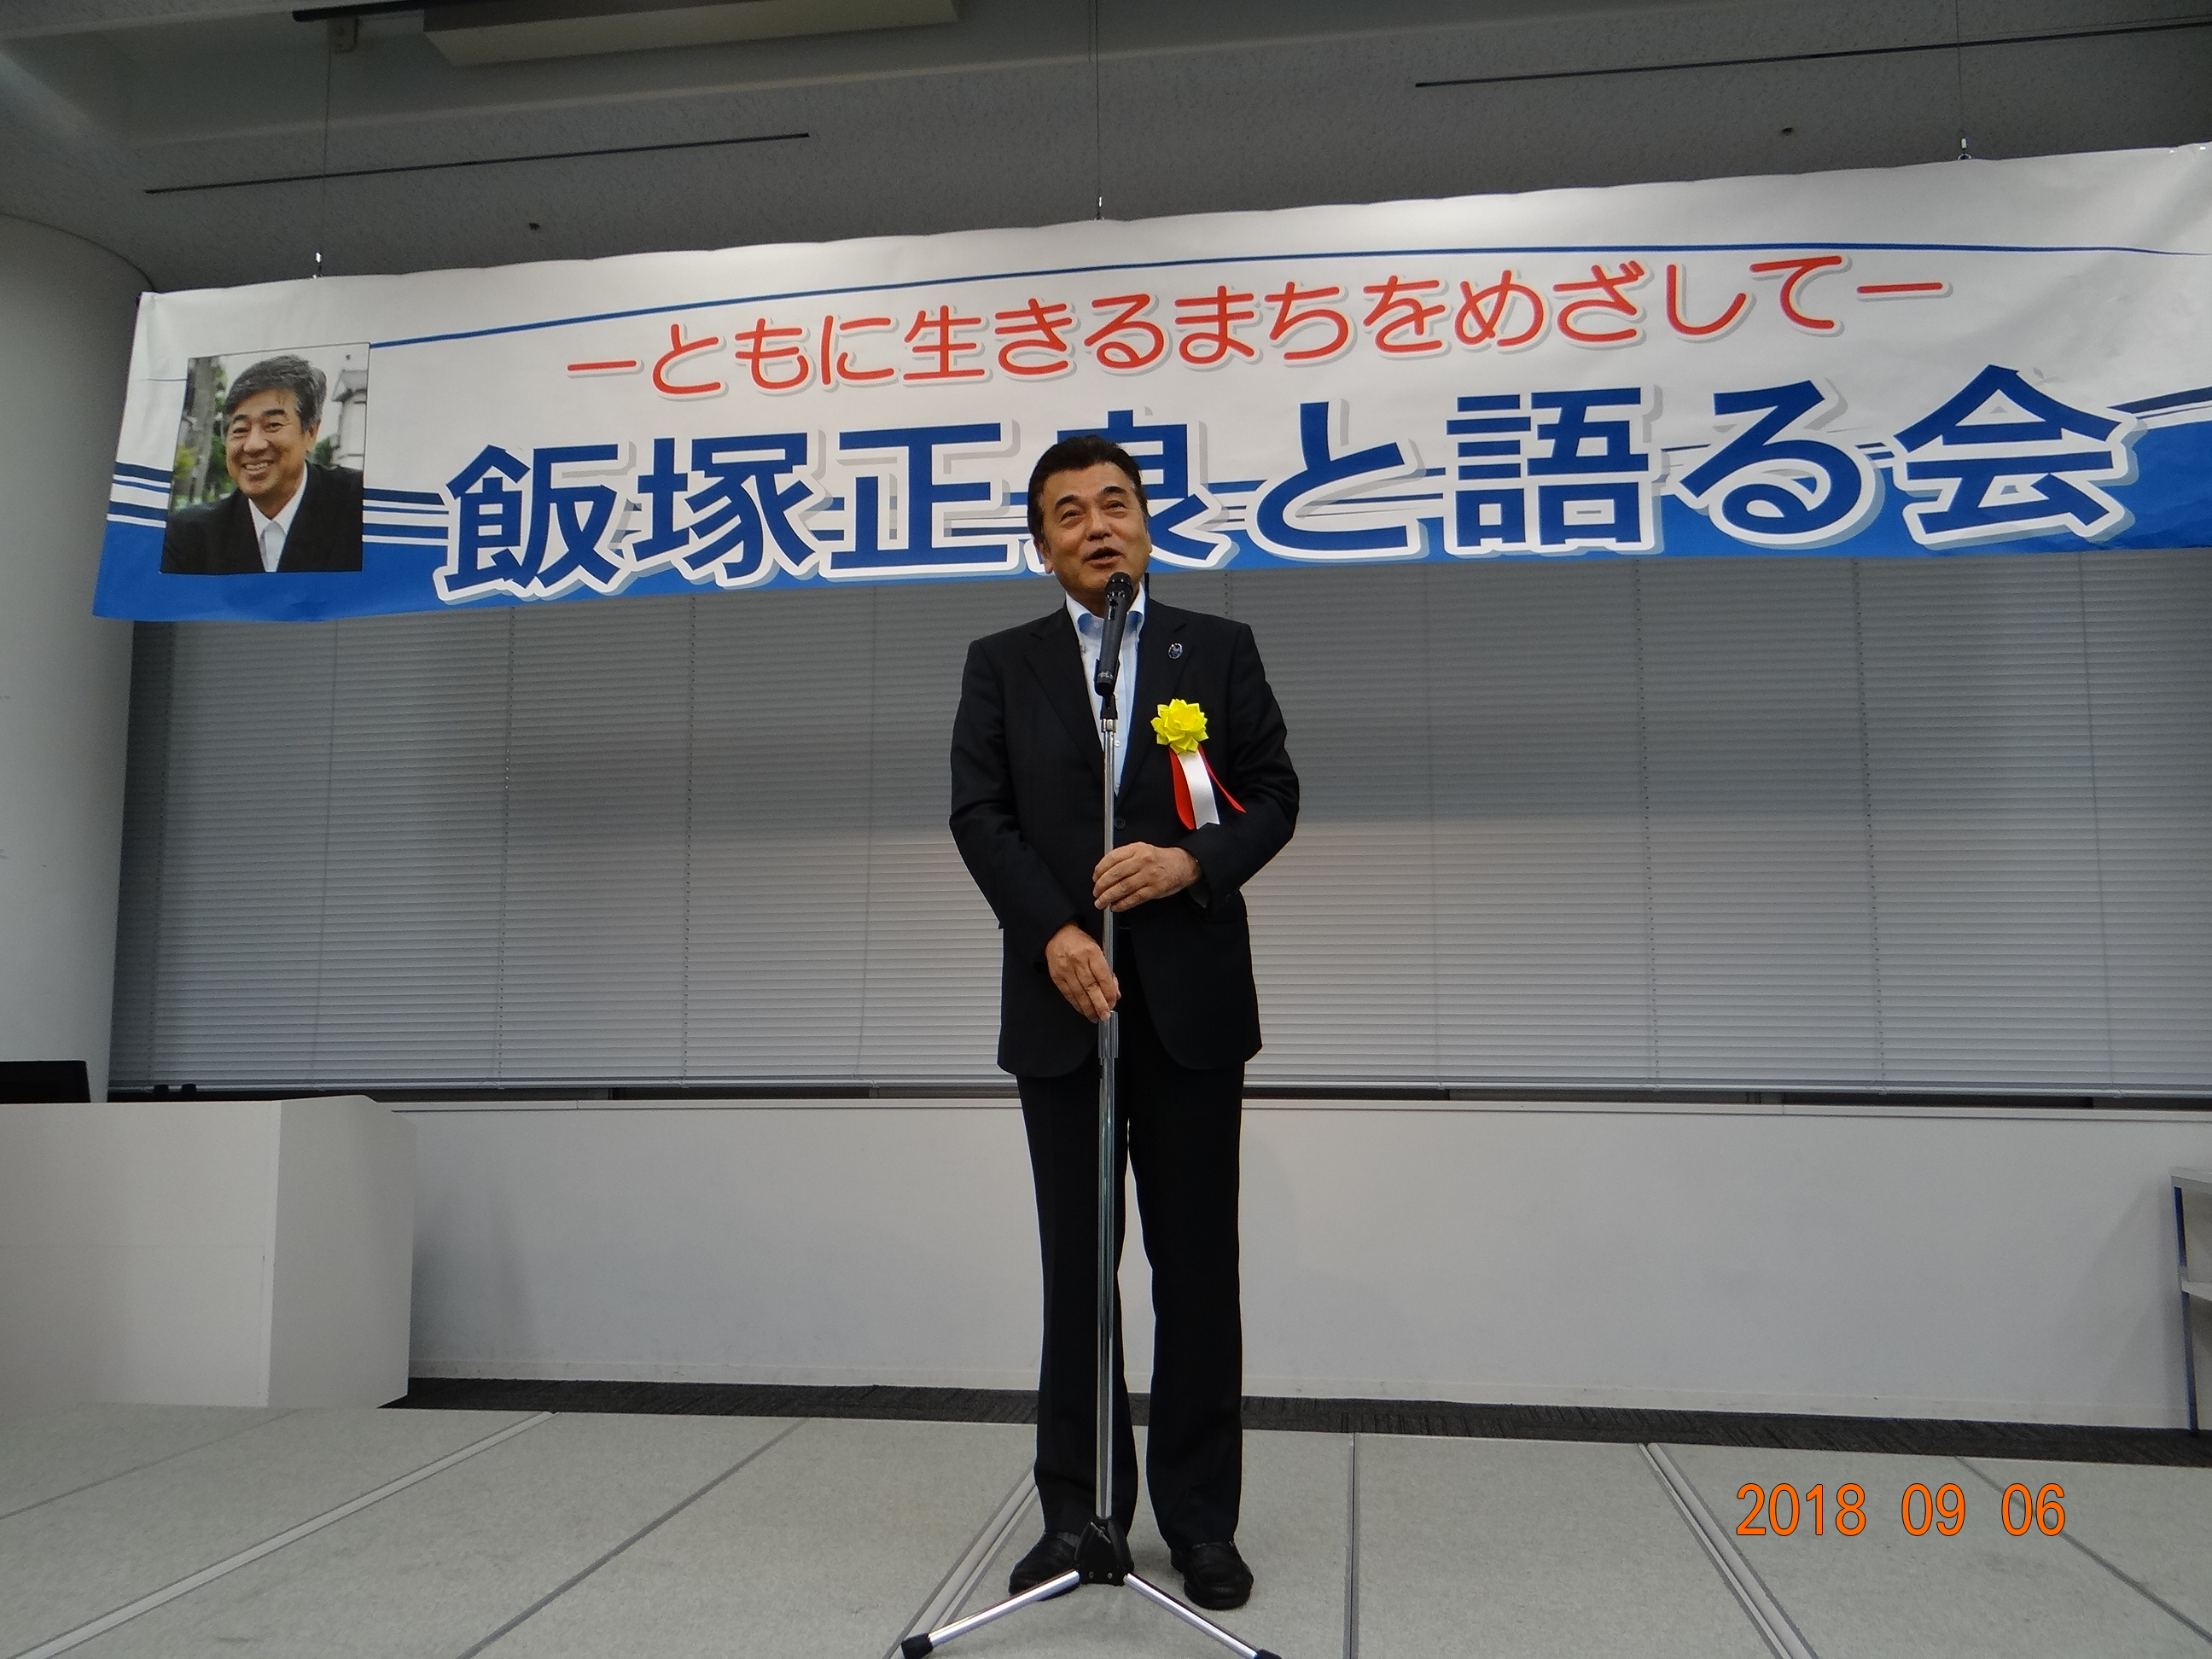 城島光力元財務大臣